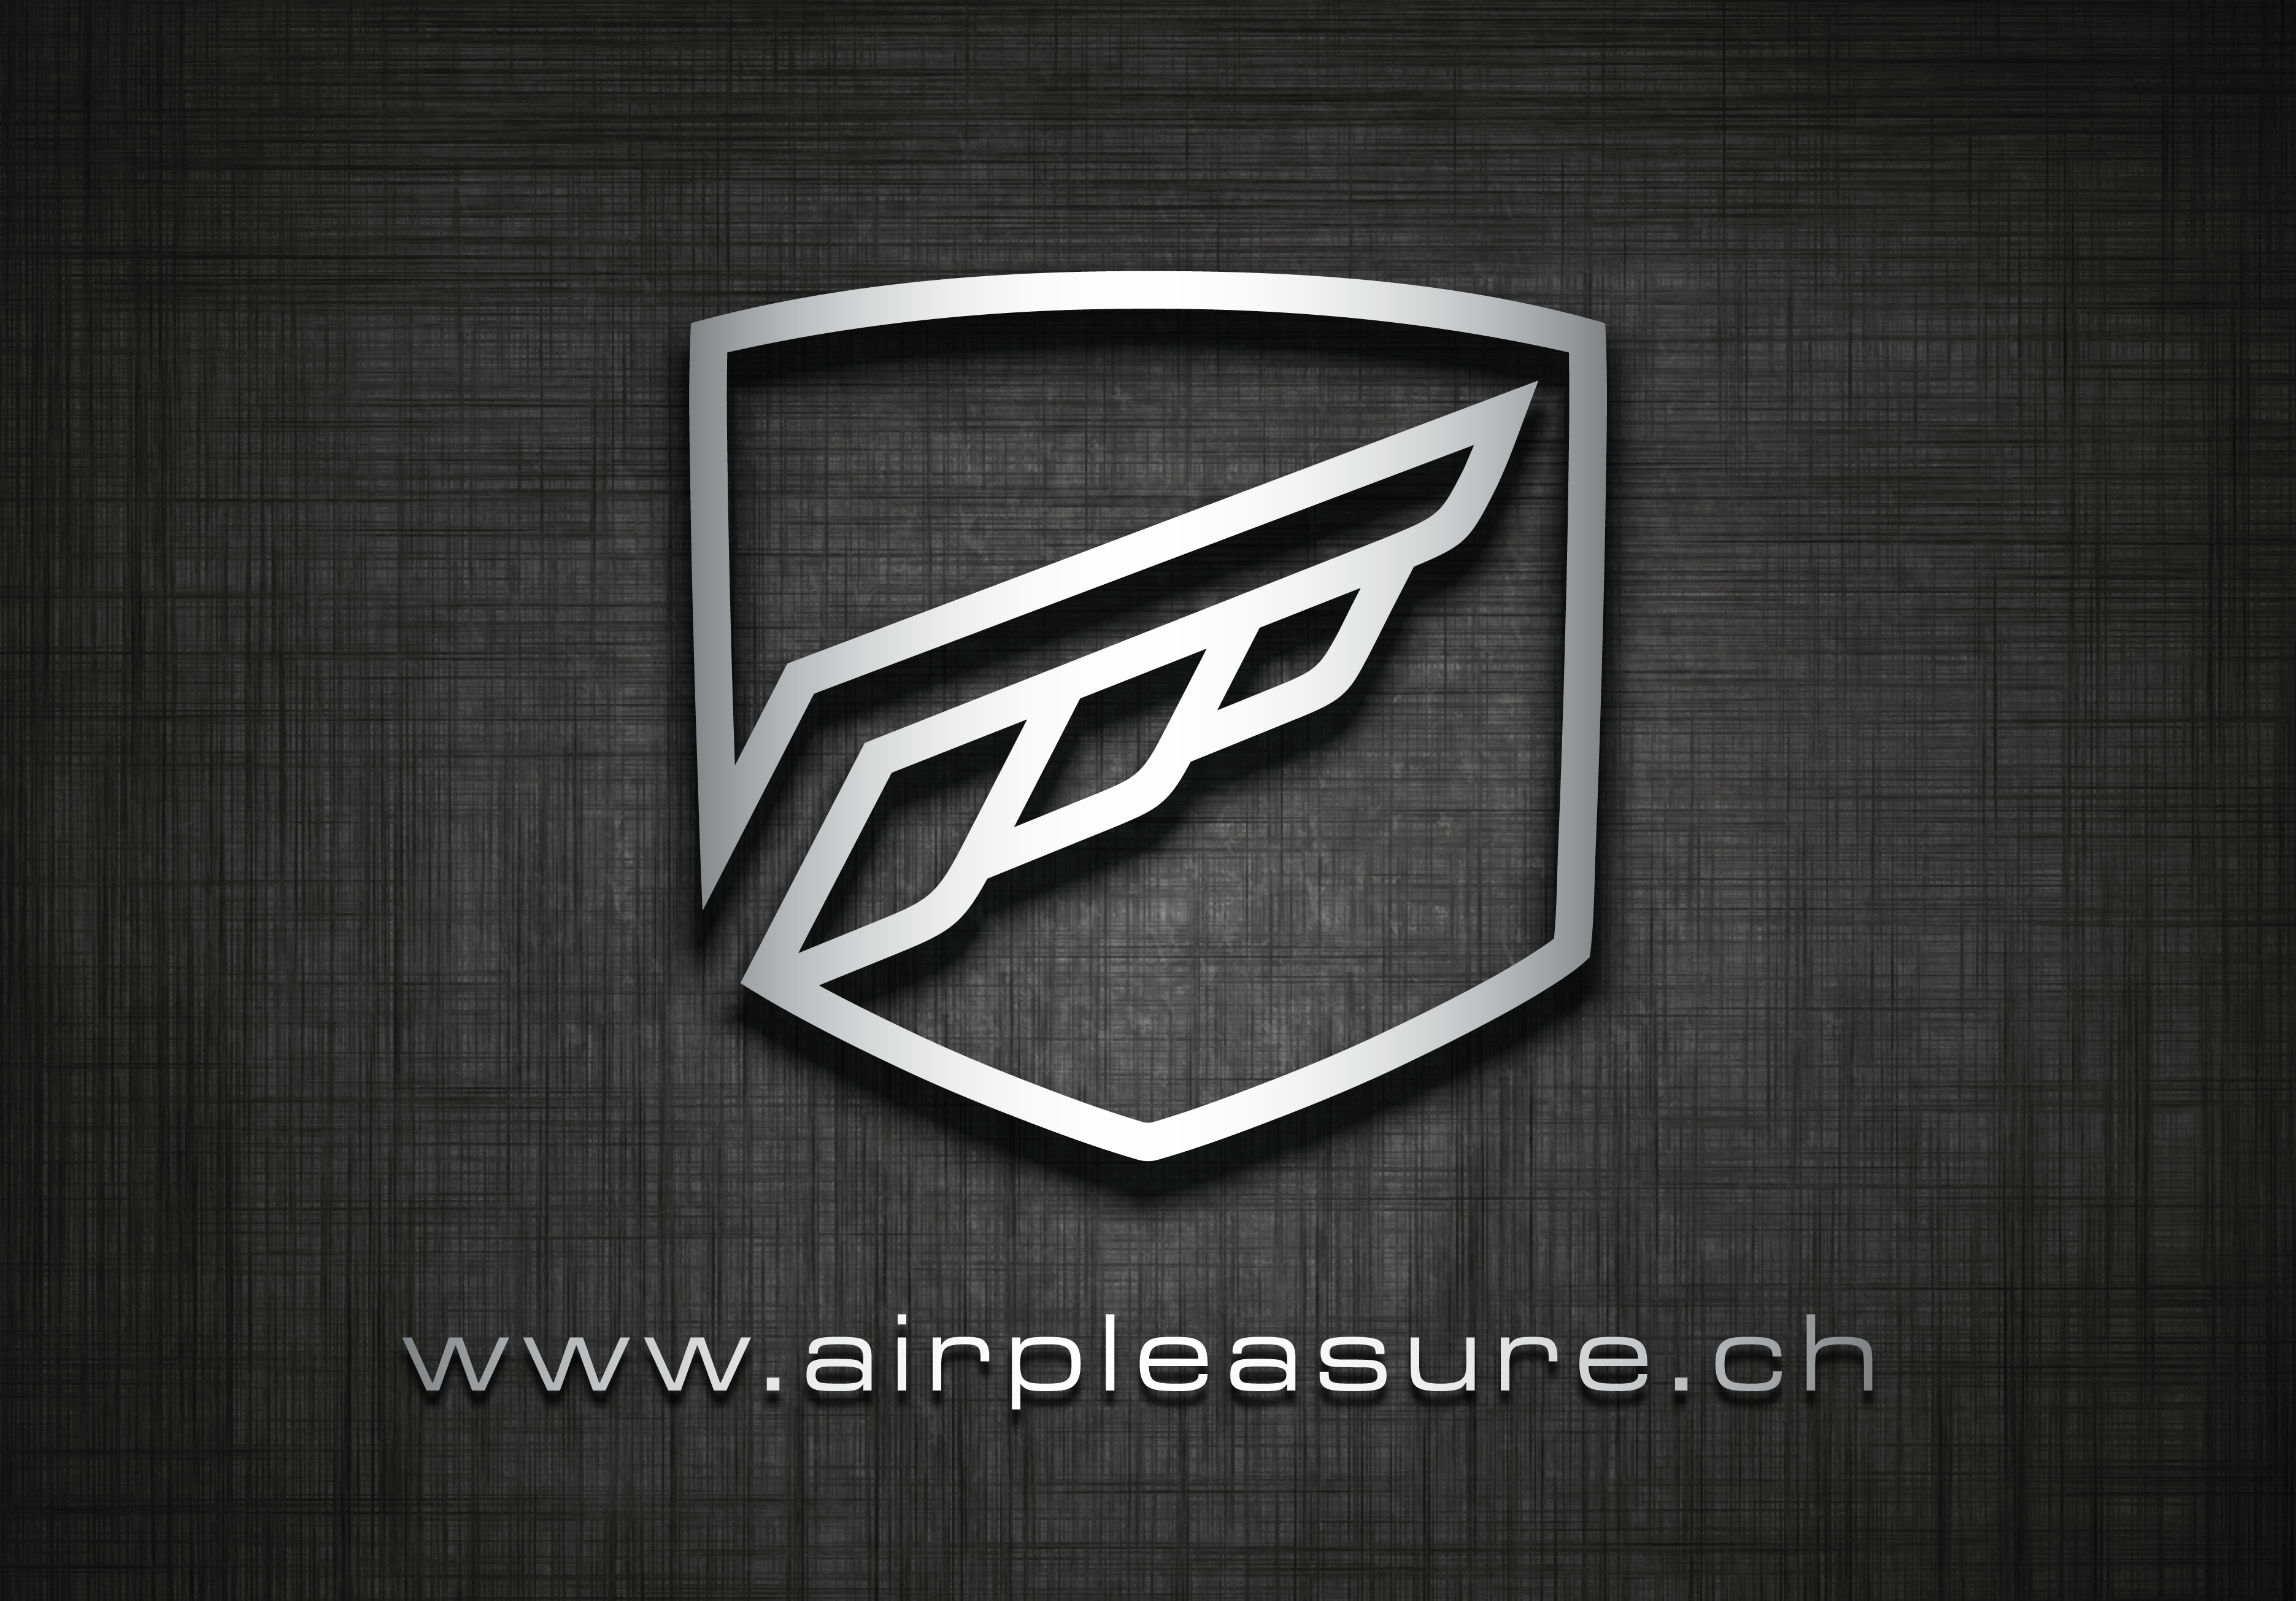 AirPleasure Image for Vids & profilfotos